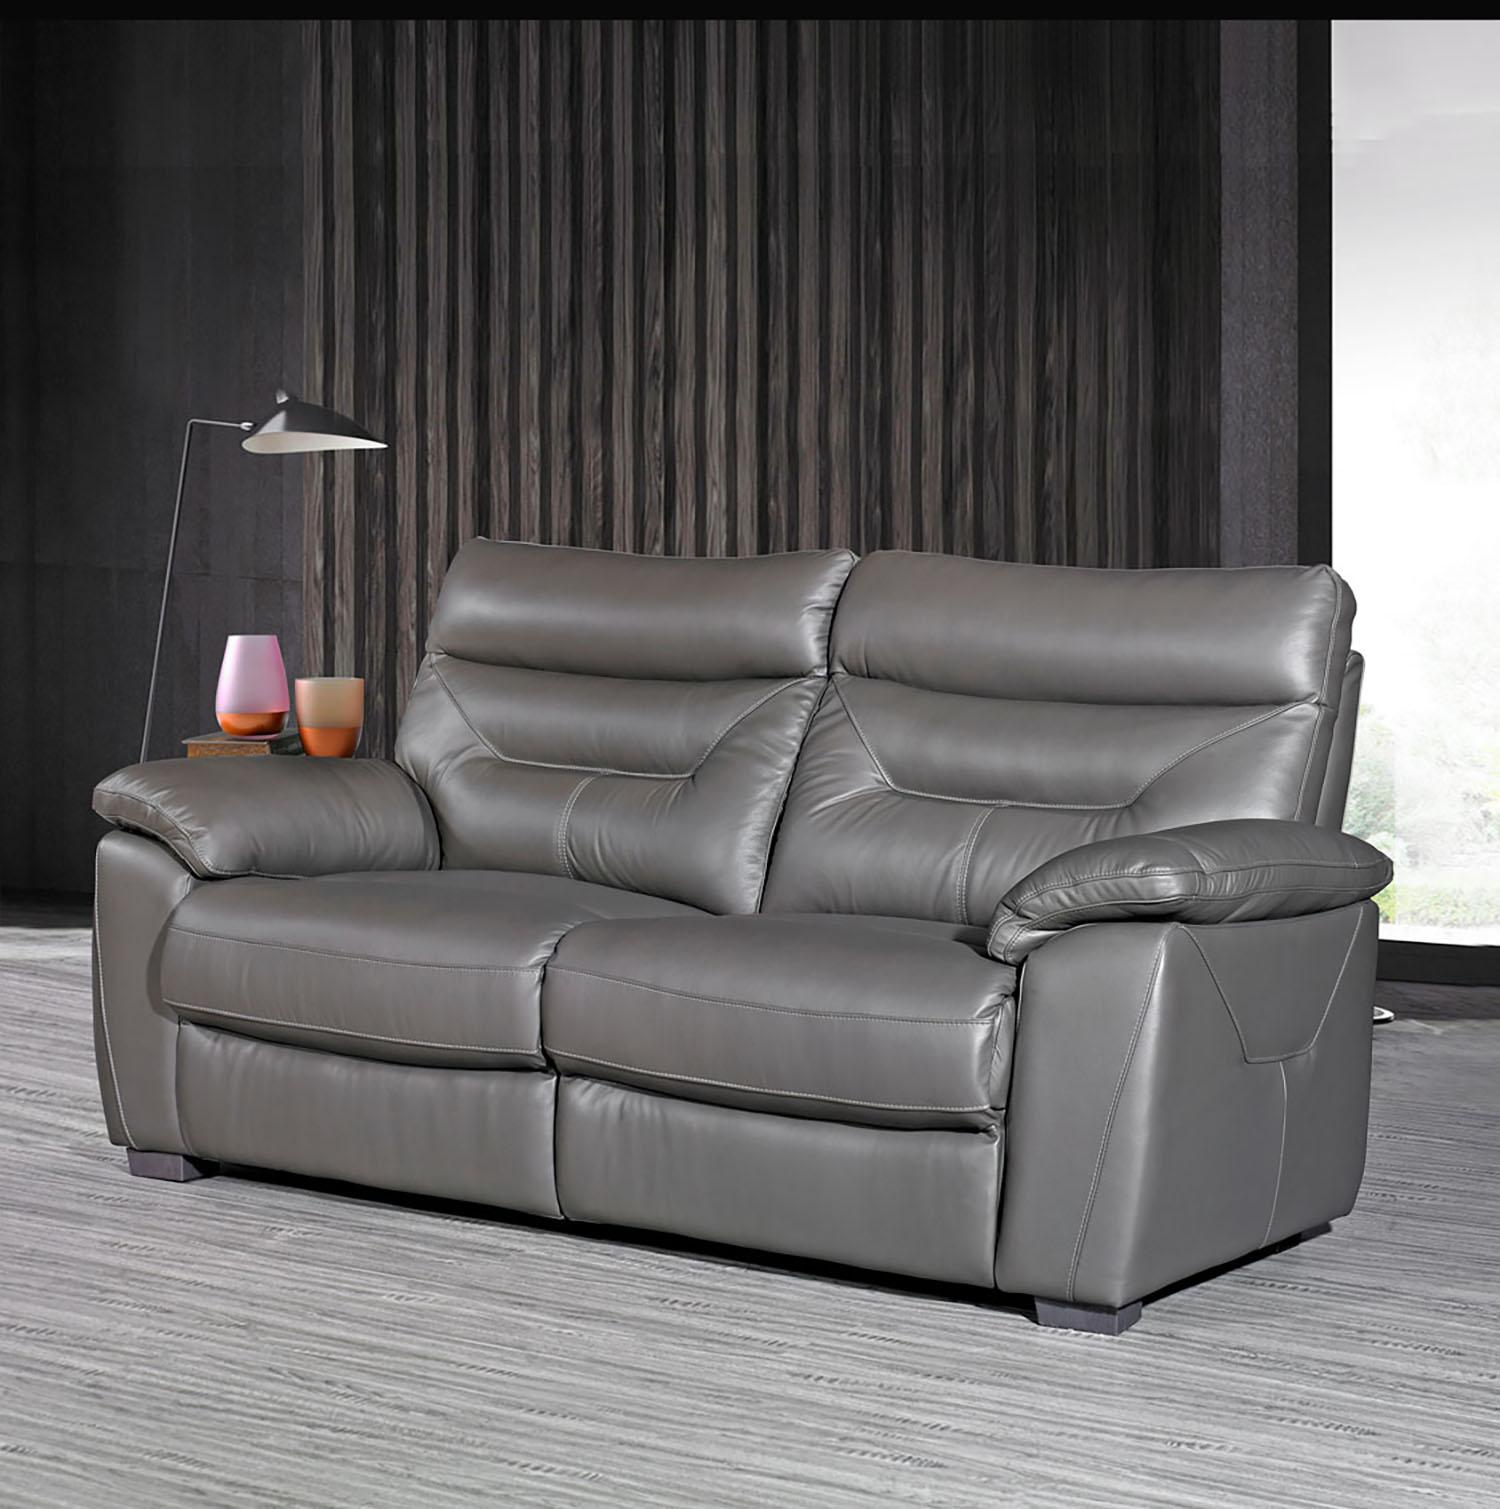 Camo 3 Seater Sofa - Grey